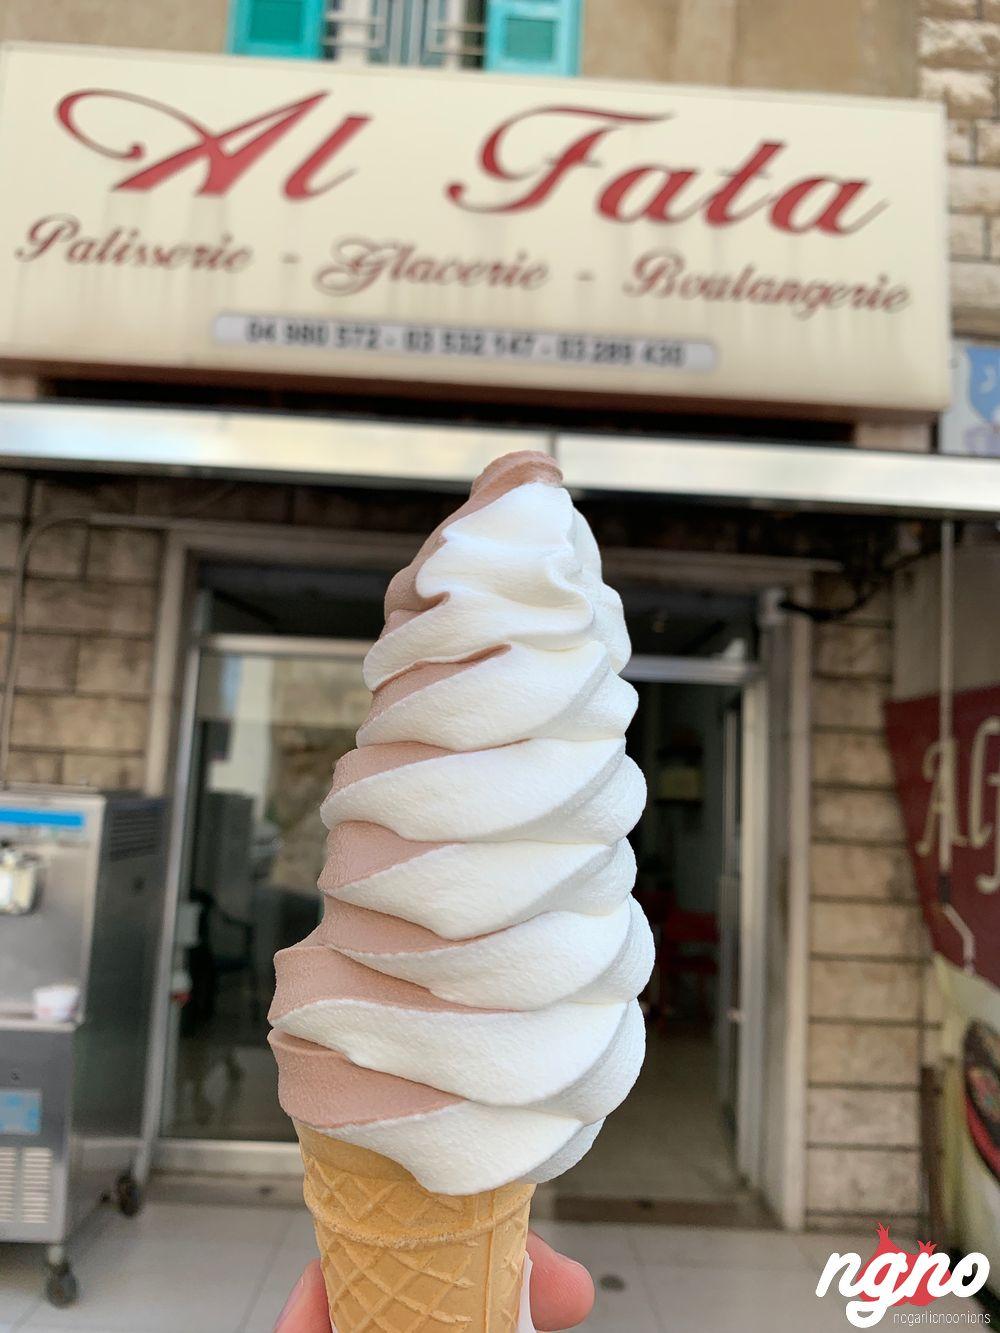 al-fata-ice-cream-beit-chabab-metn-nogarlicnoonions-312019-07-06-06-11-27